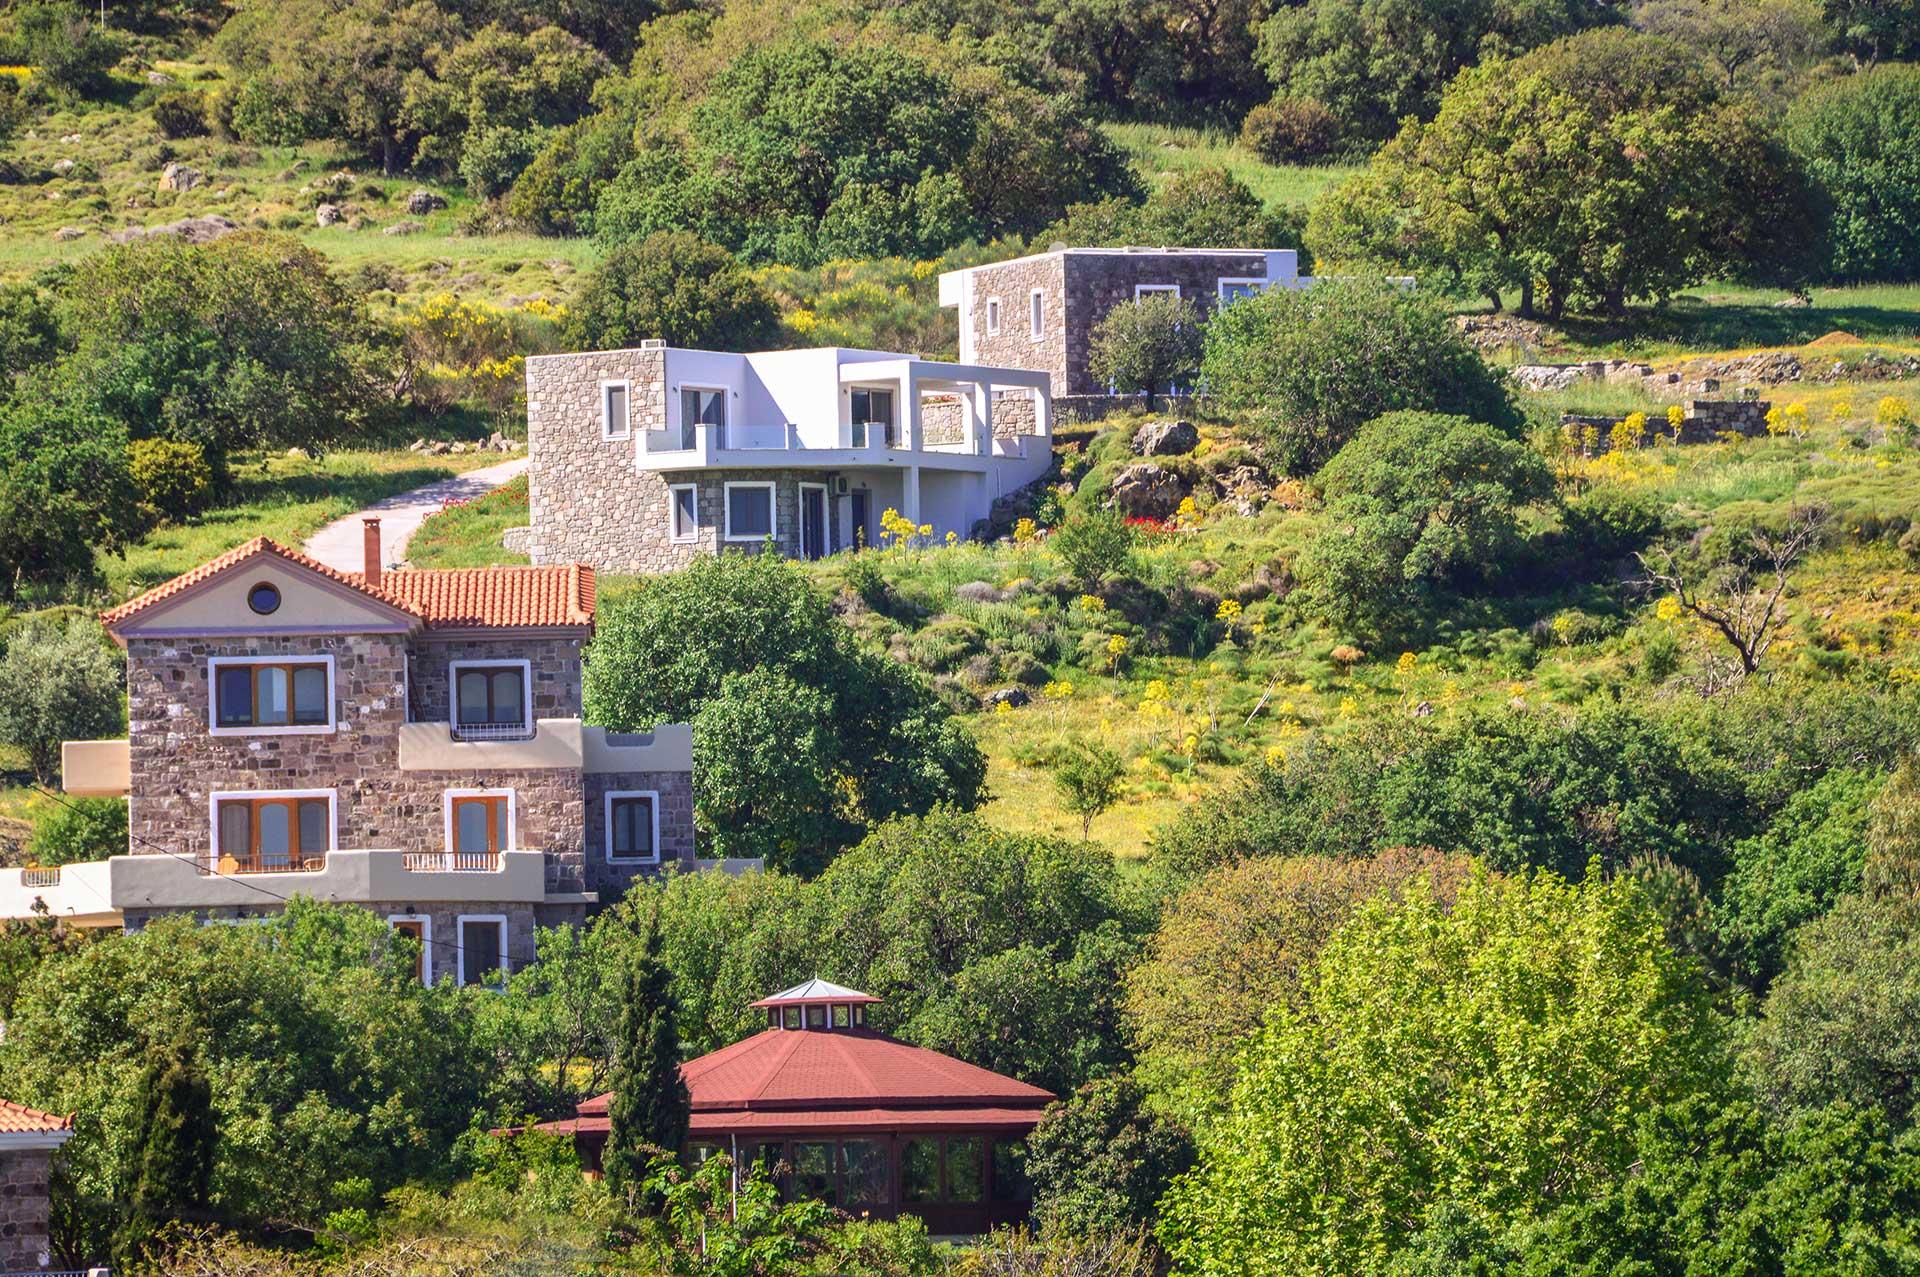 milelja-serenity houses